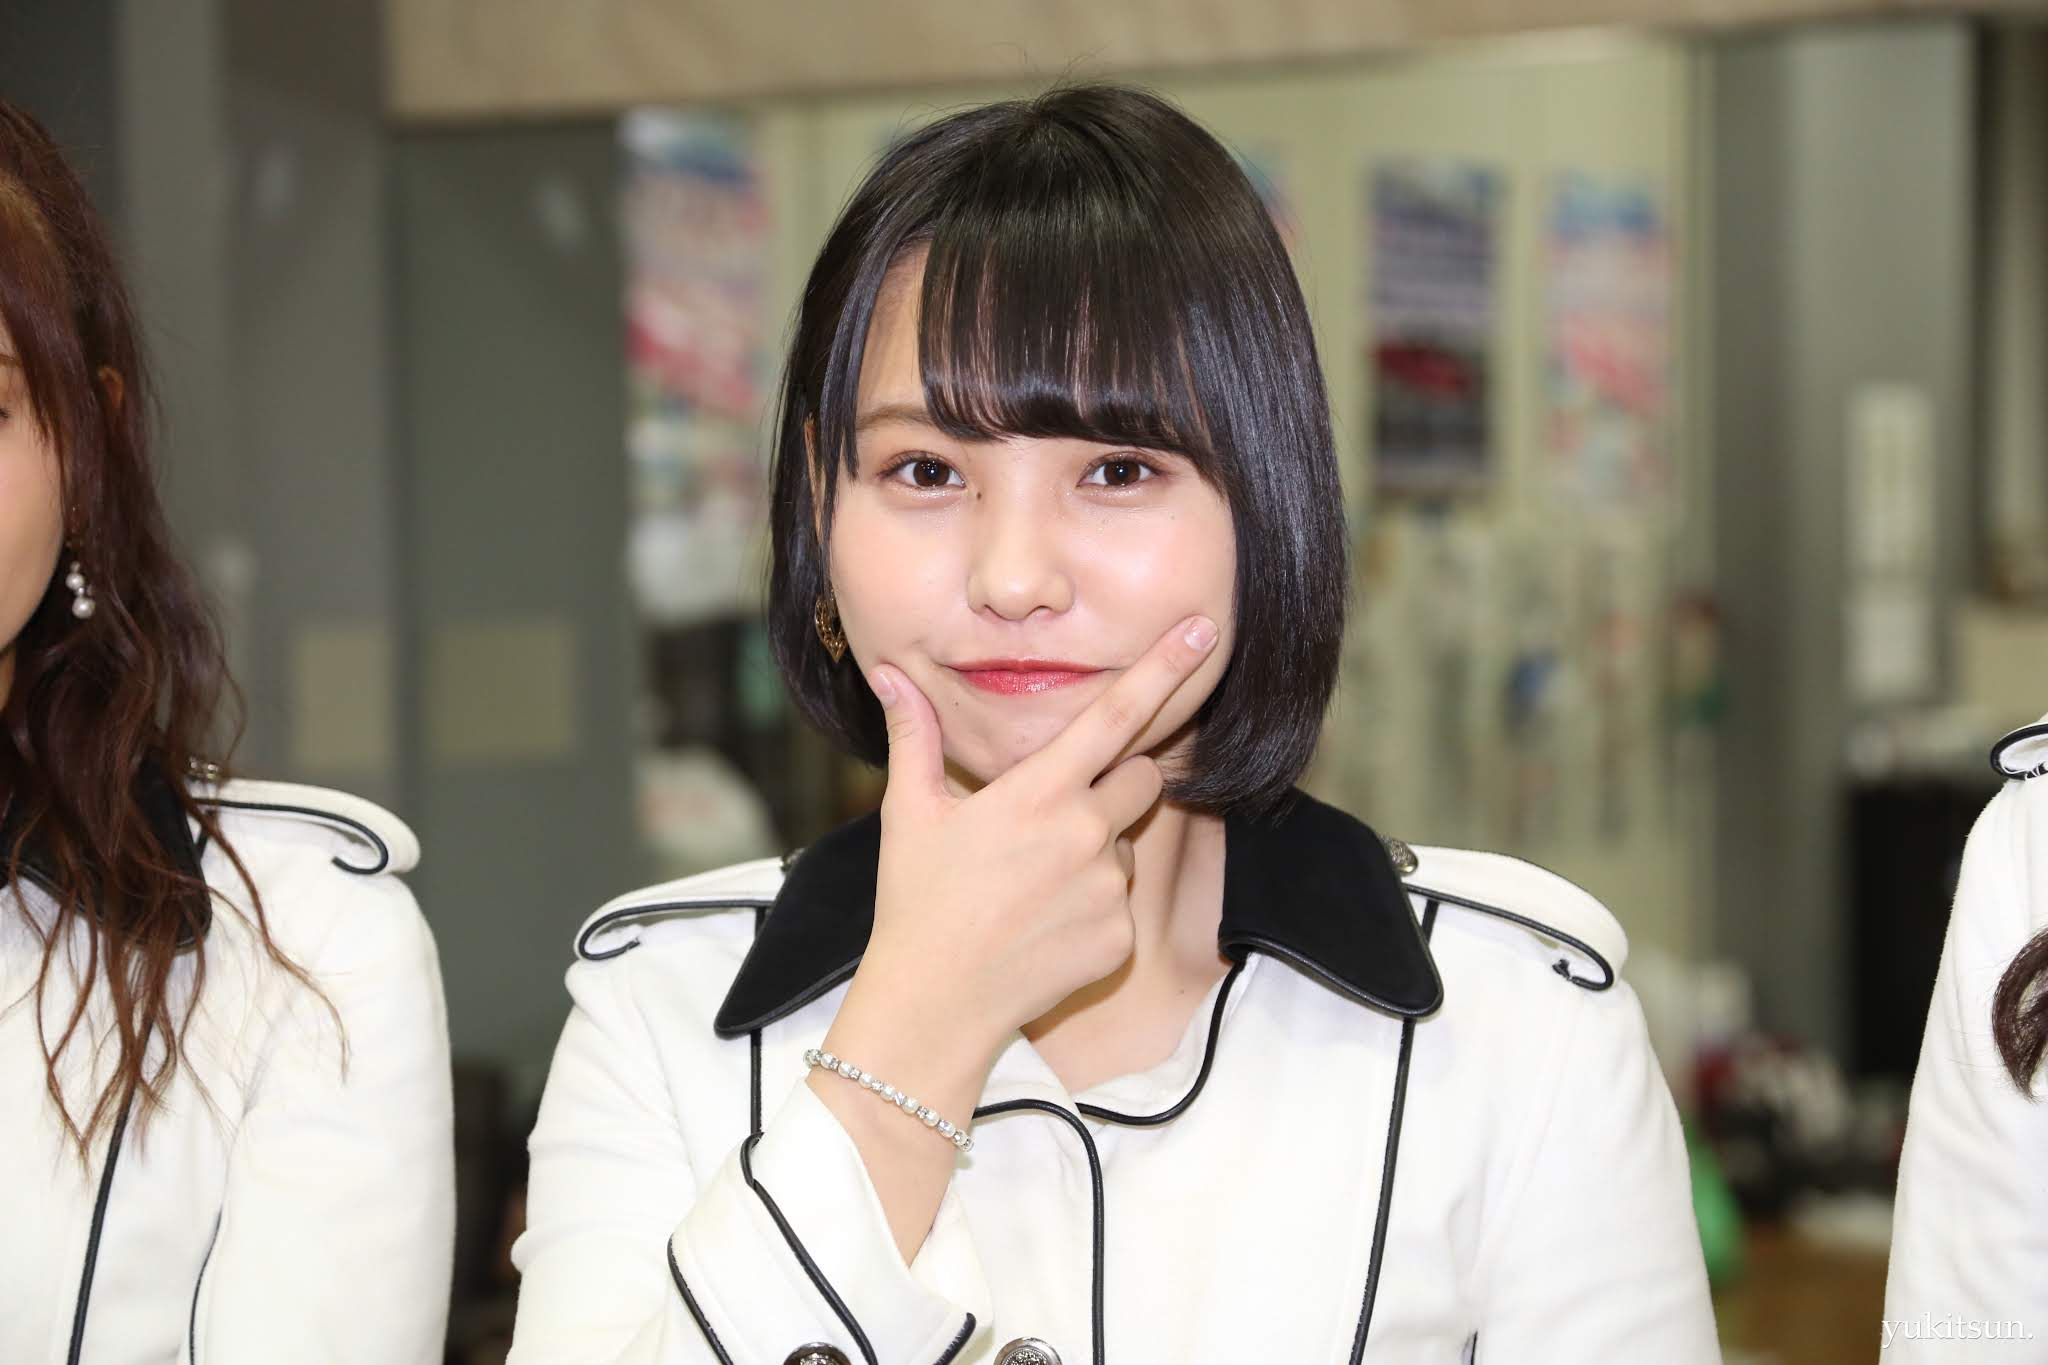 yuzu-45